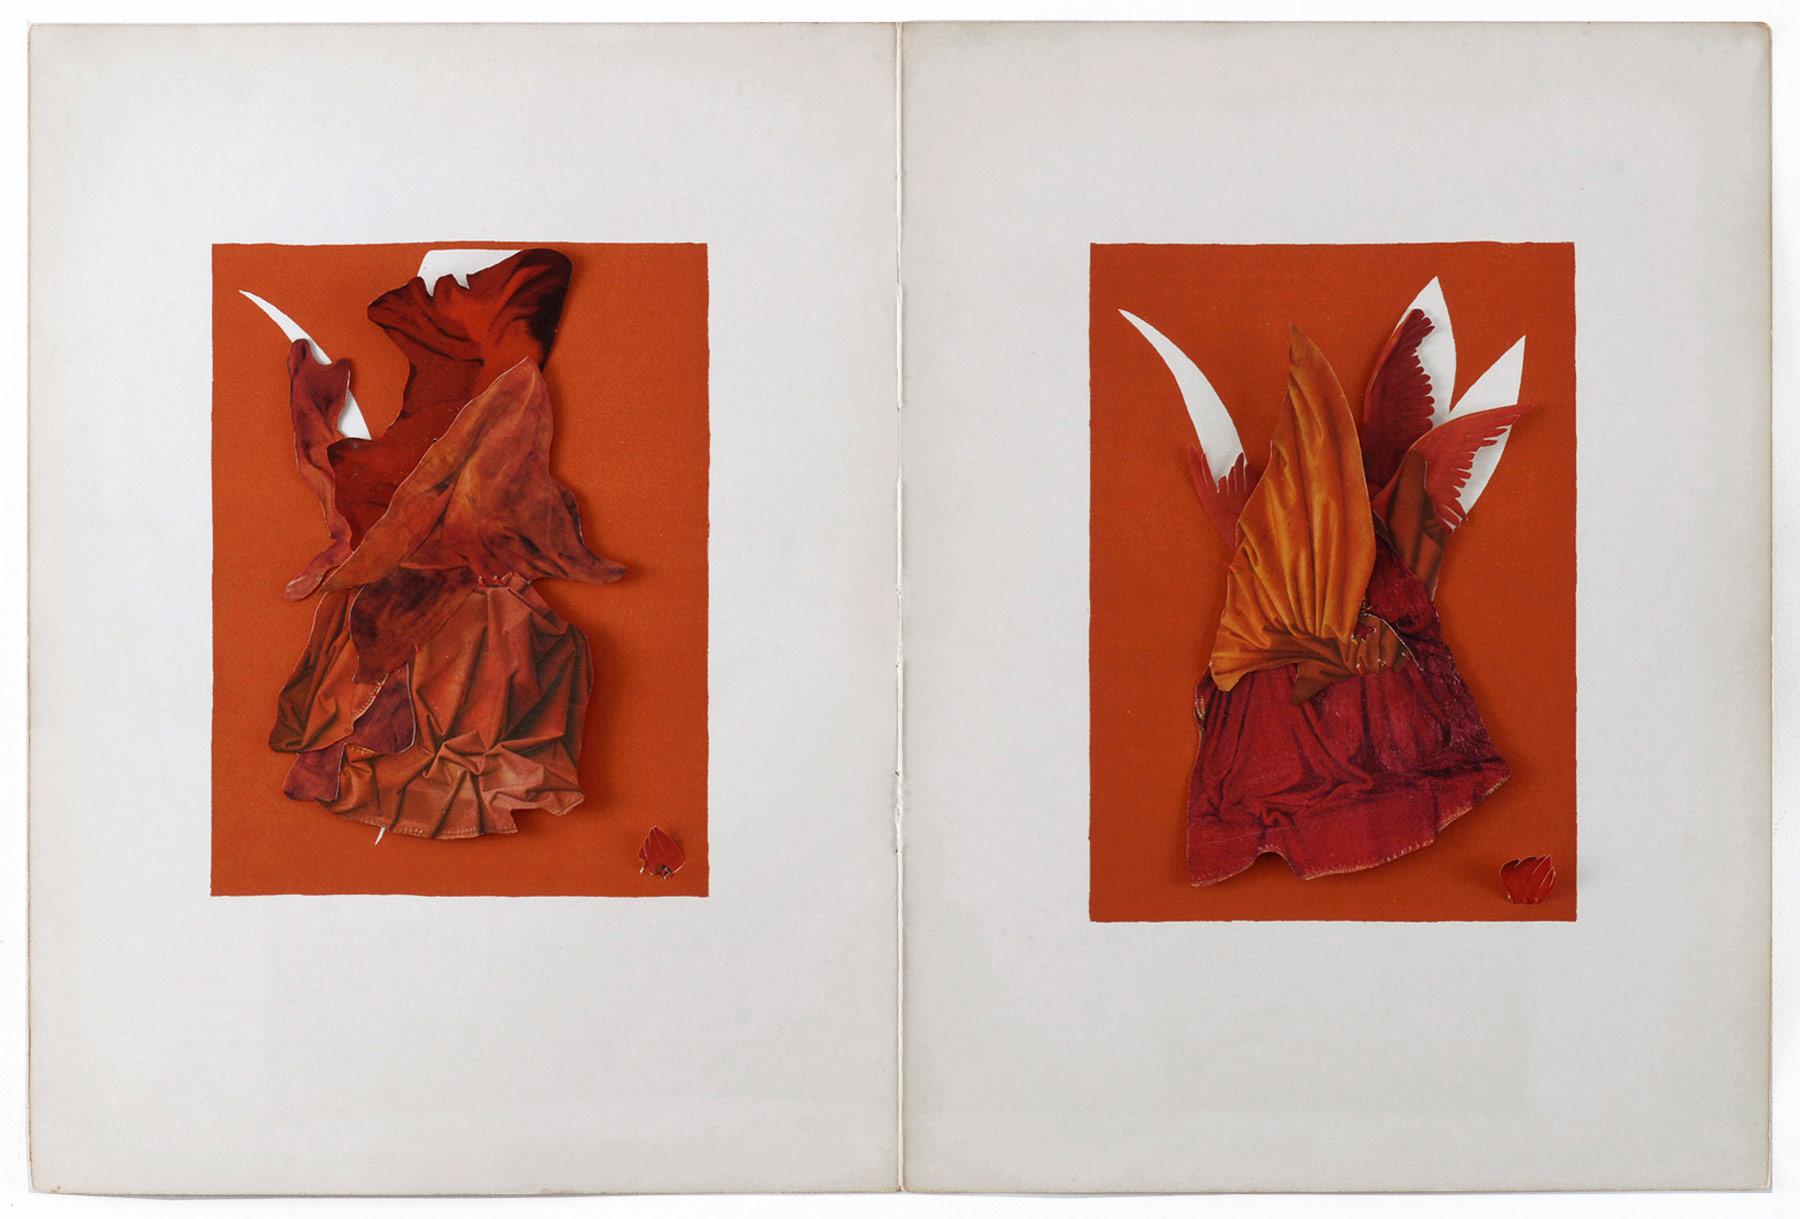 Collage#36, 2010. (Frente). Collage,papel, hilo. 35,4 x 52,6 cm.